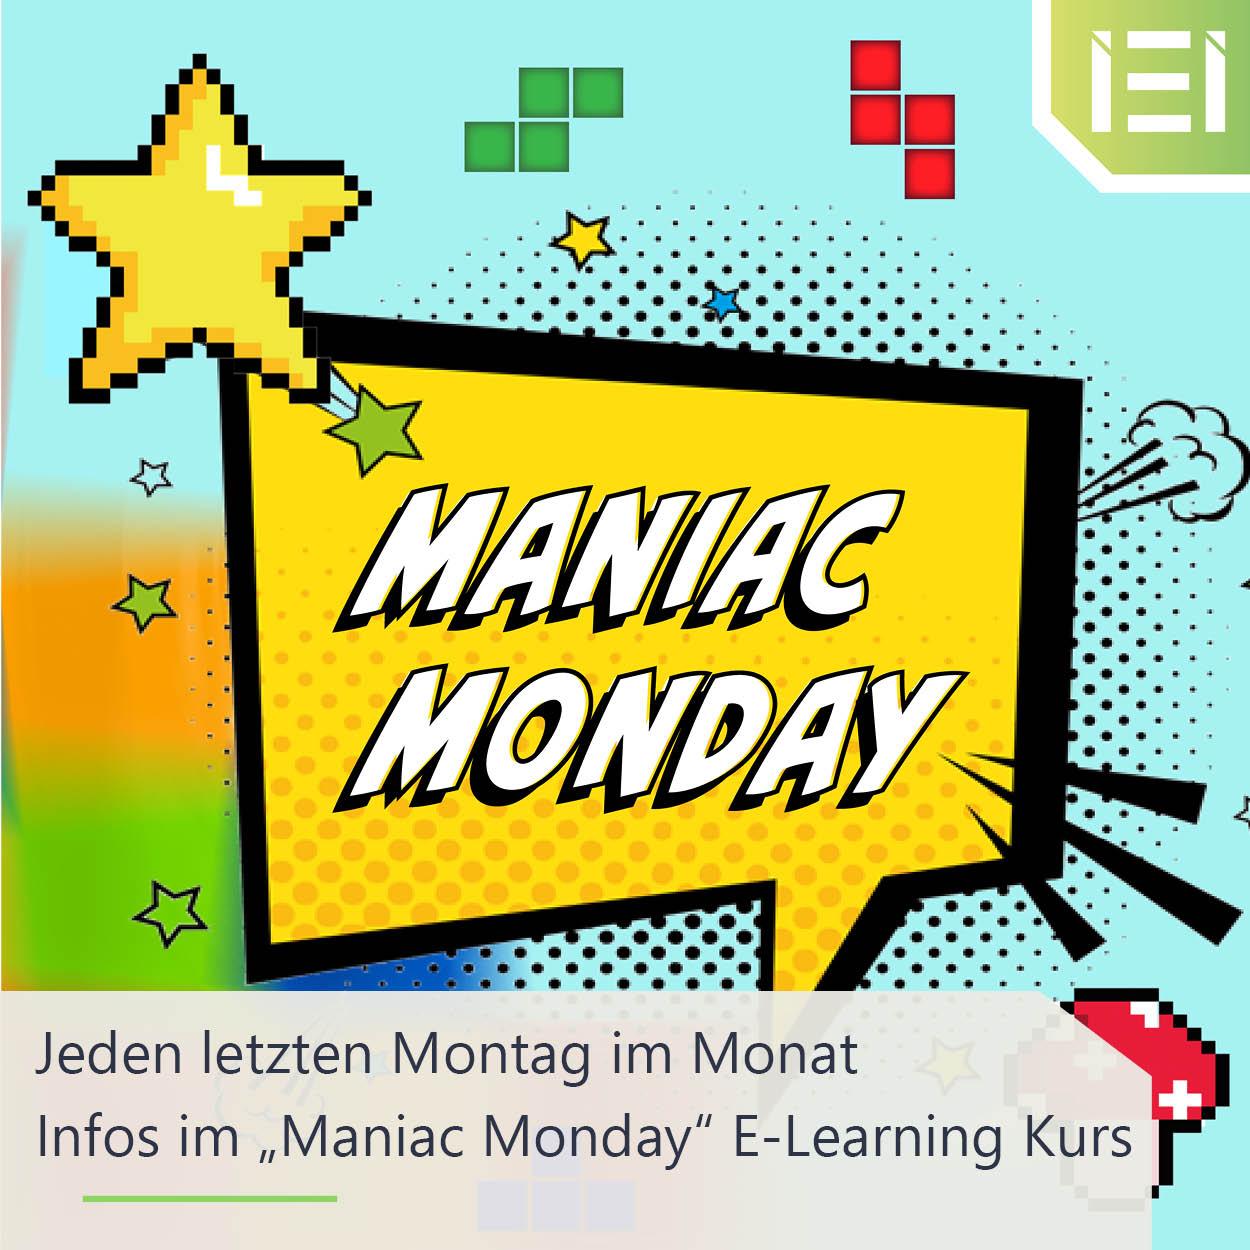 Maniac Monday